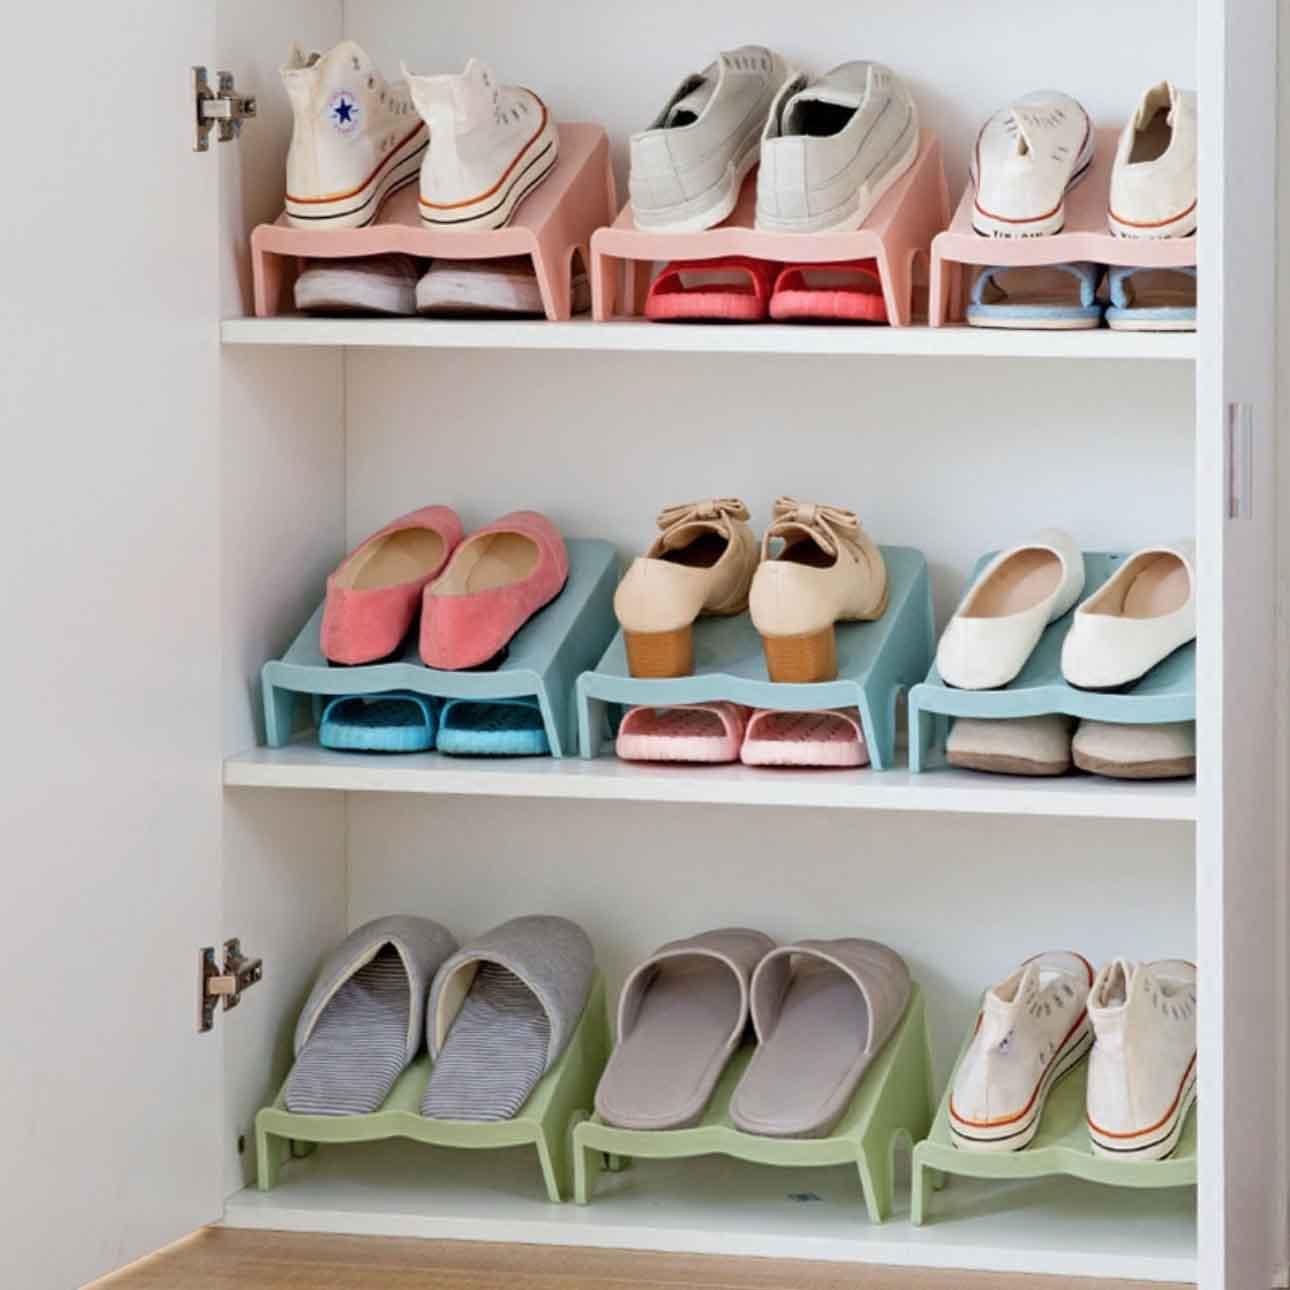 double layer shoe organizer organiser holder shoe rack cabinet design style degree sg singapore